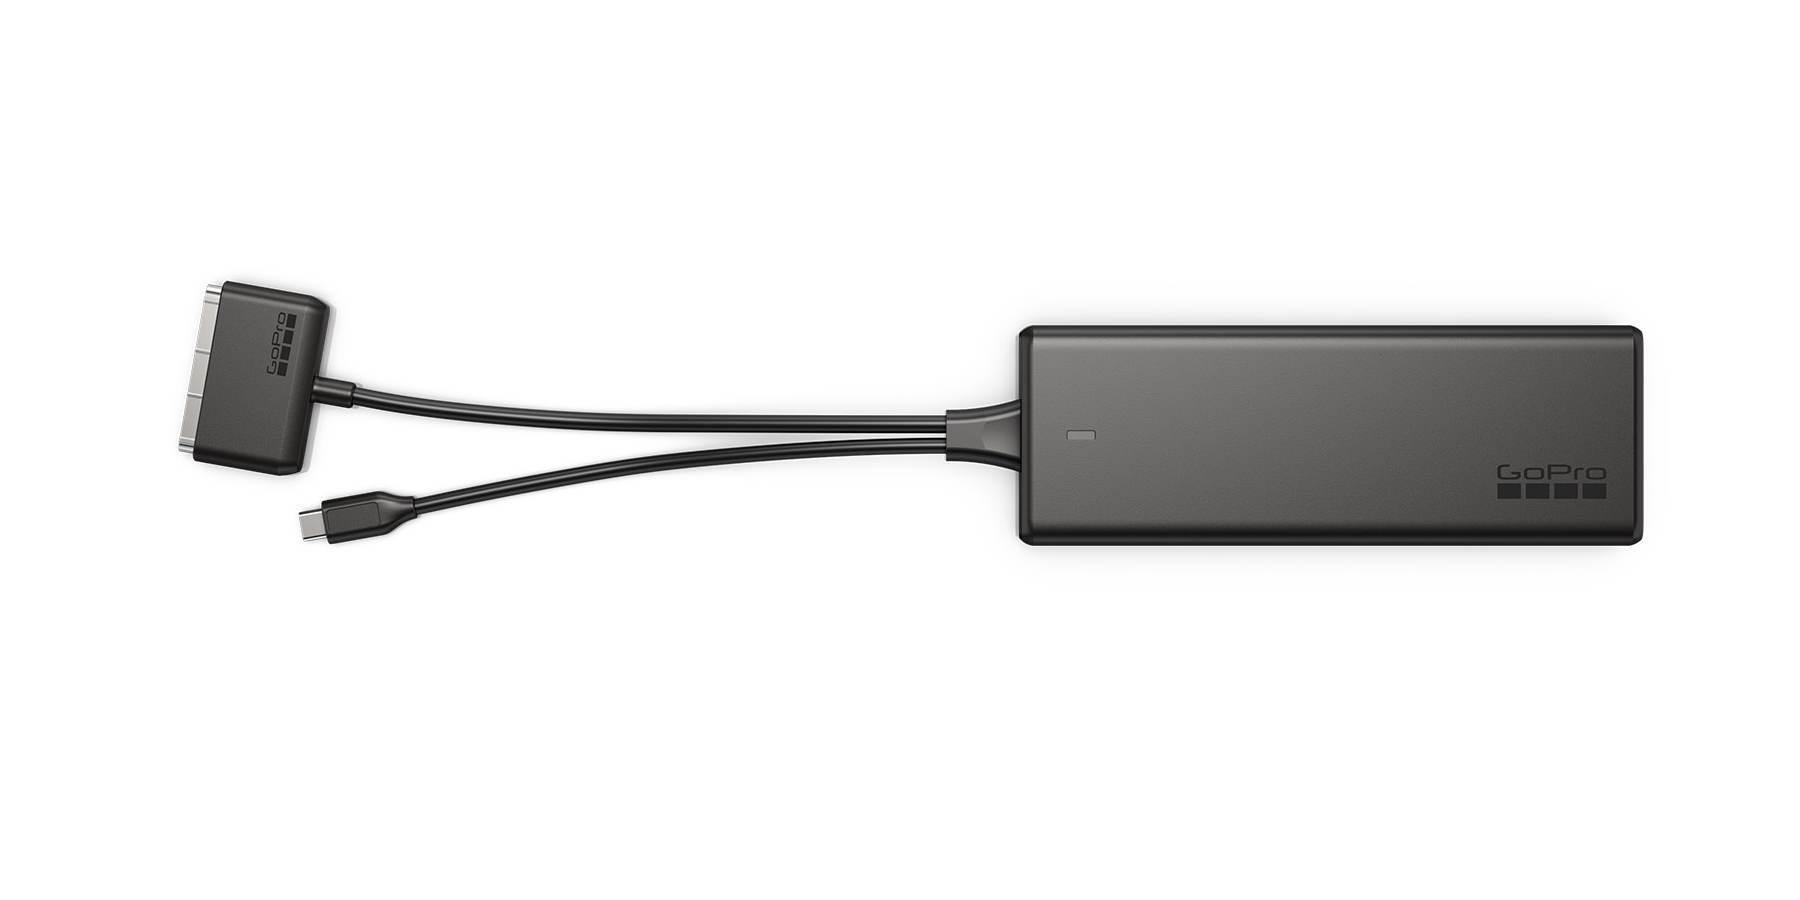 Зарядное устройство GoPro Karma Replacement Wall Charger